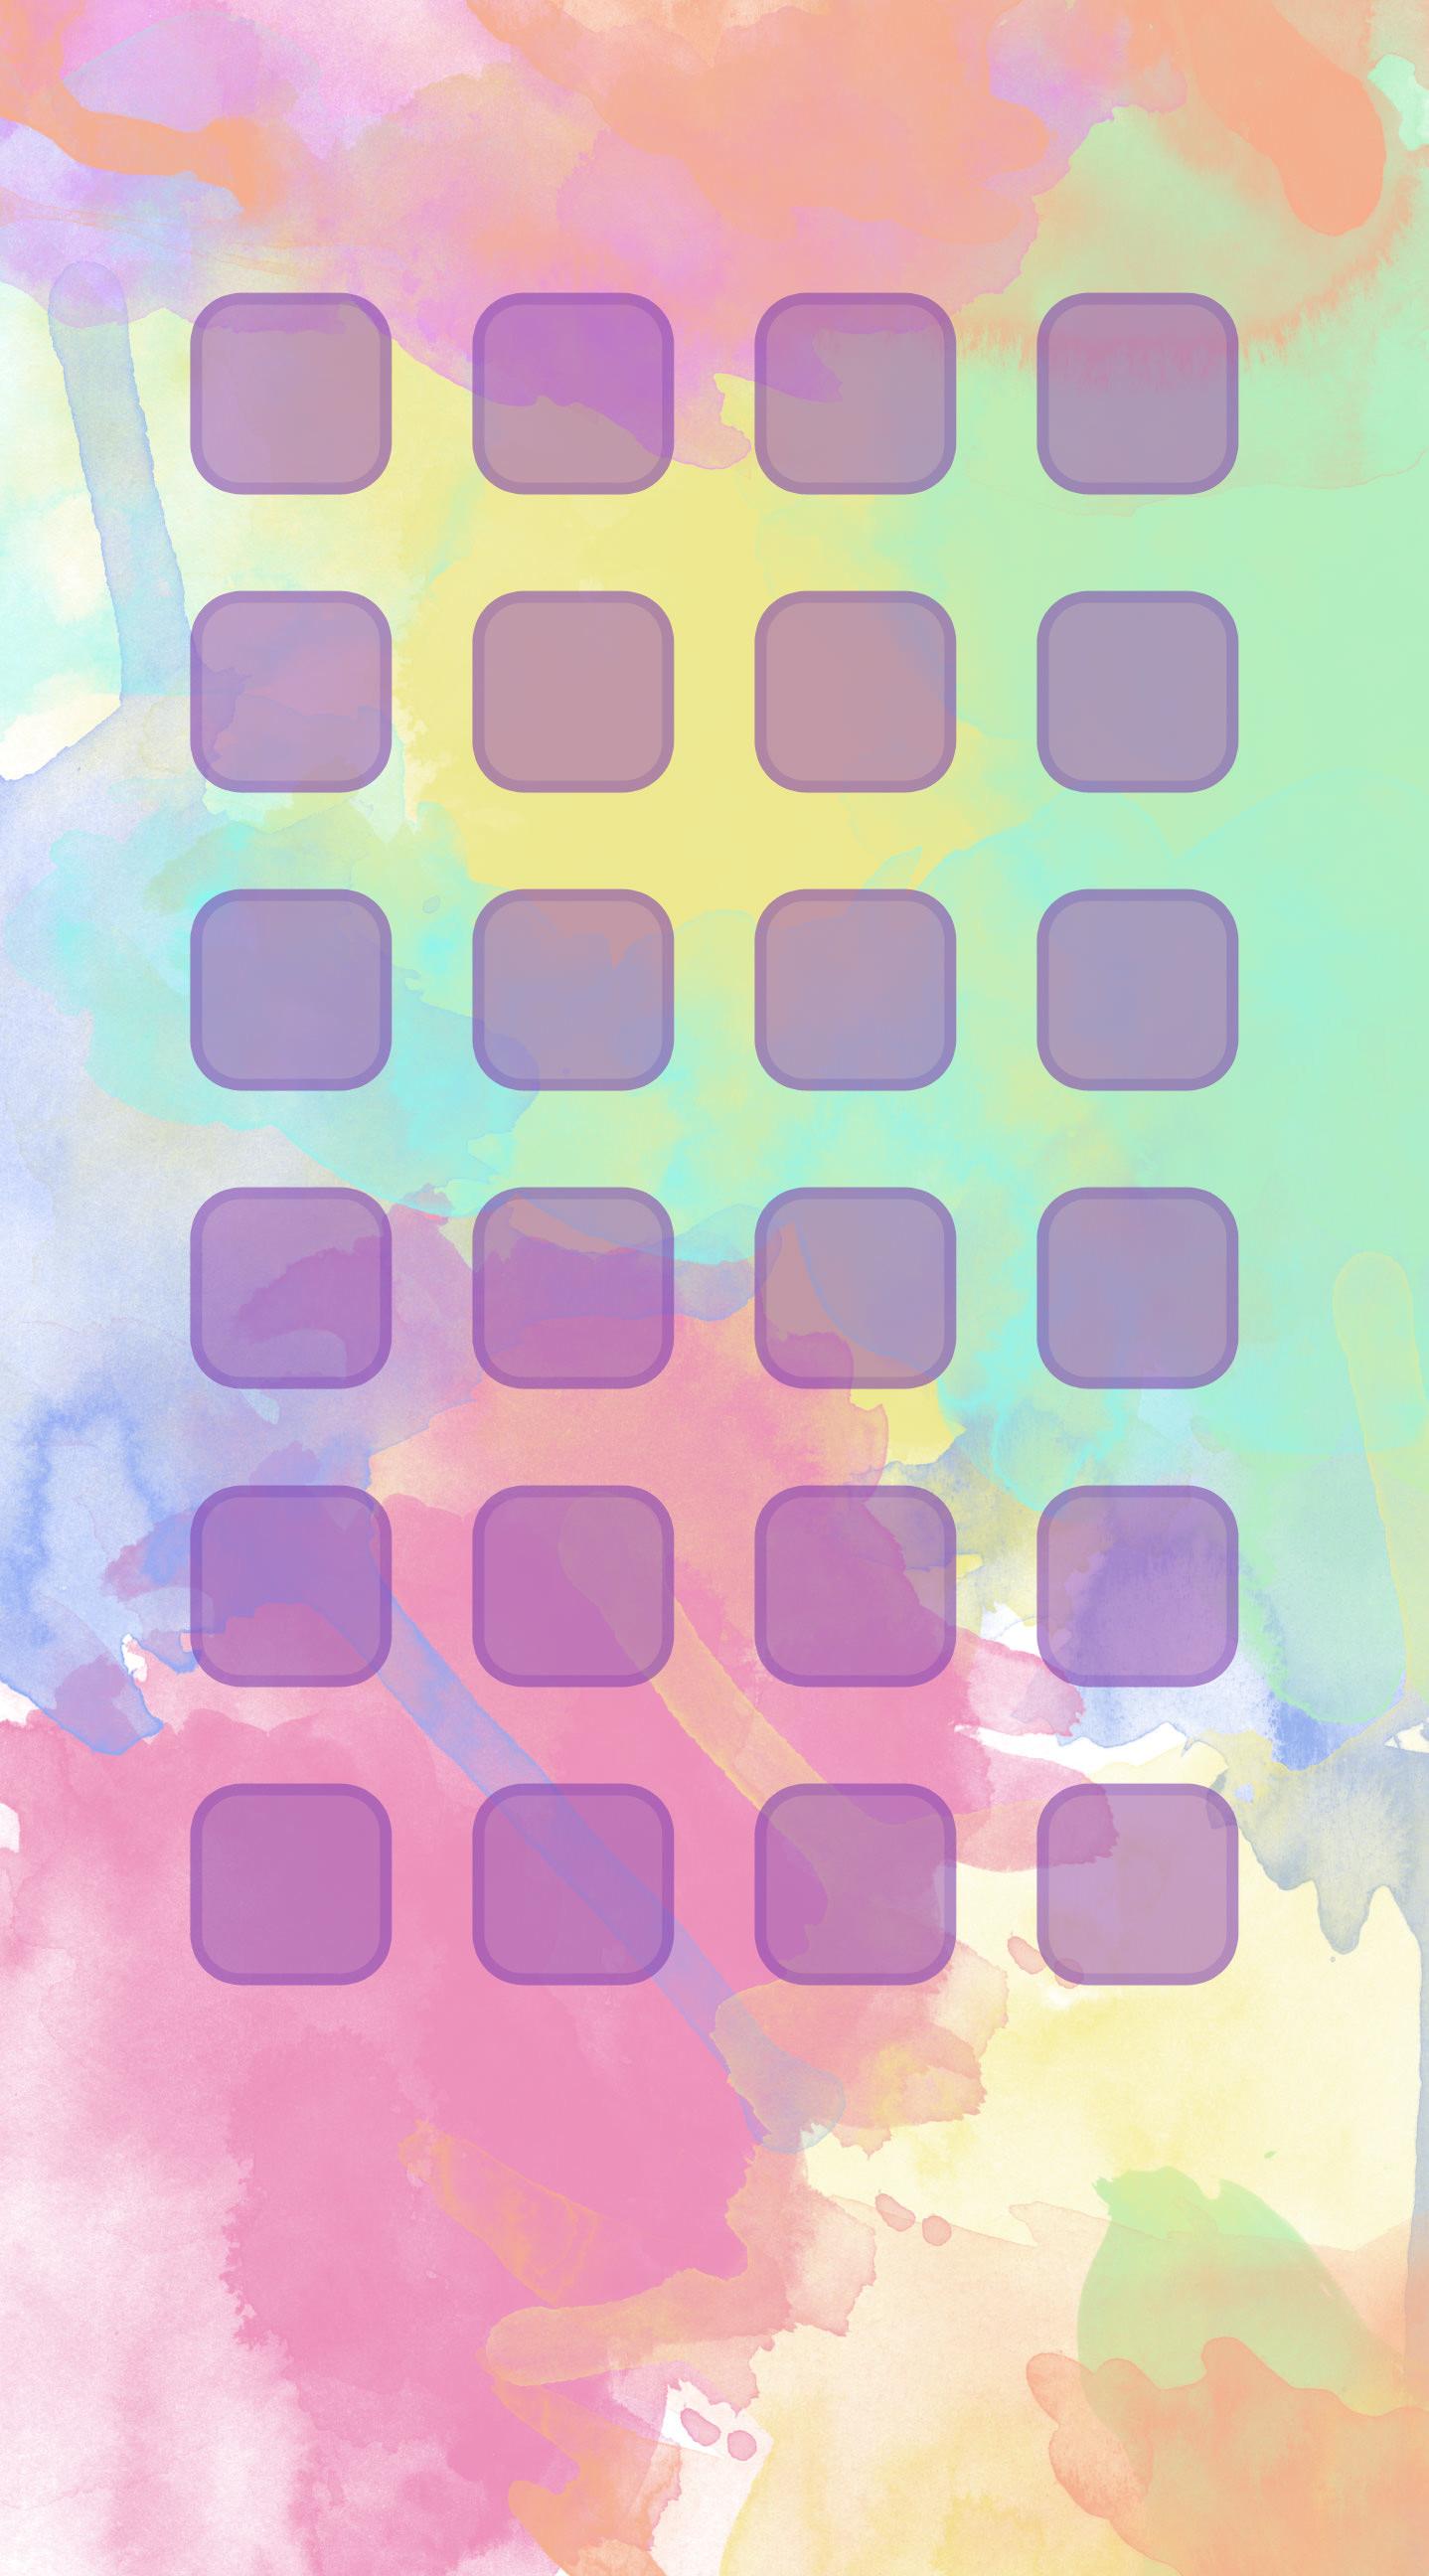 Cool teenage wallpapers 41 images - Teen iphone wallpaper ...